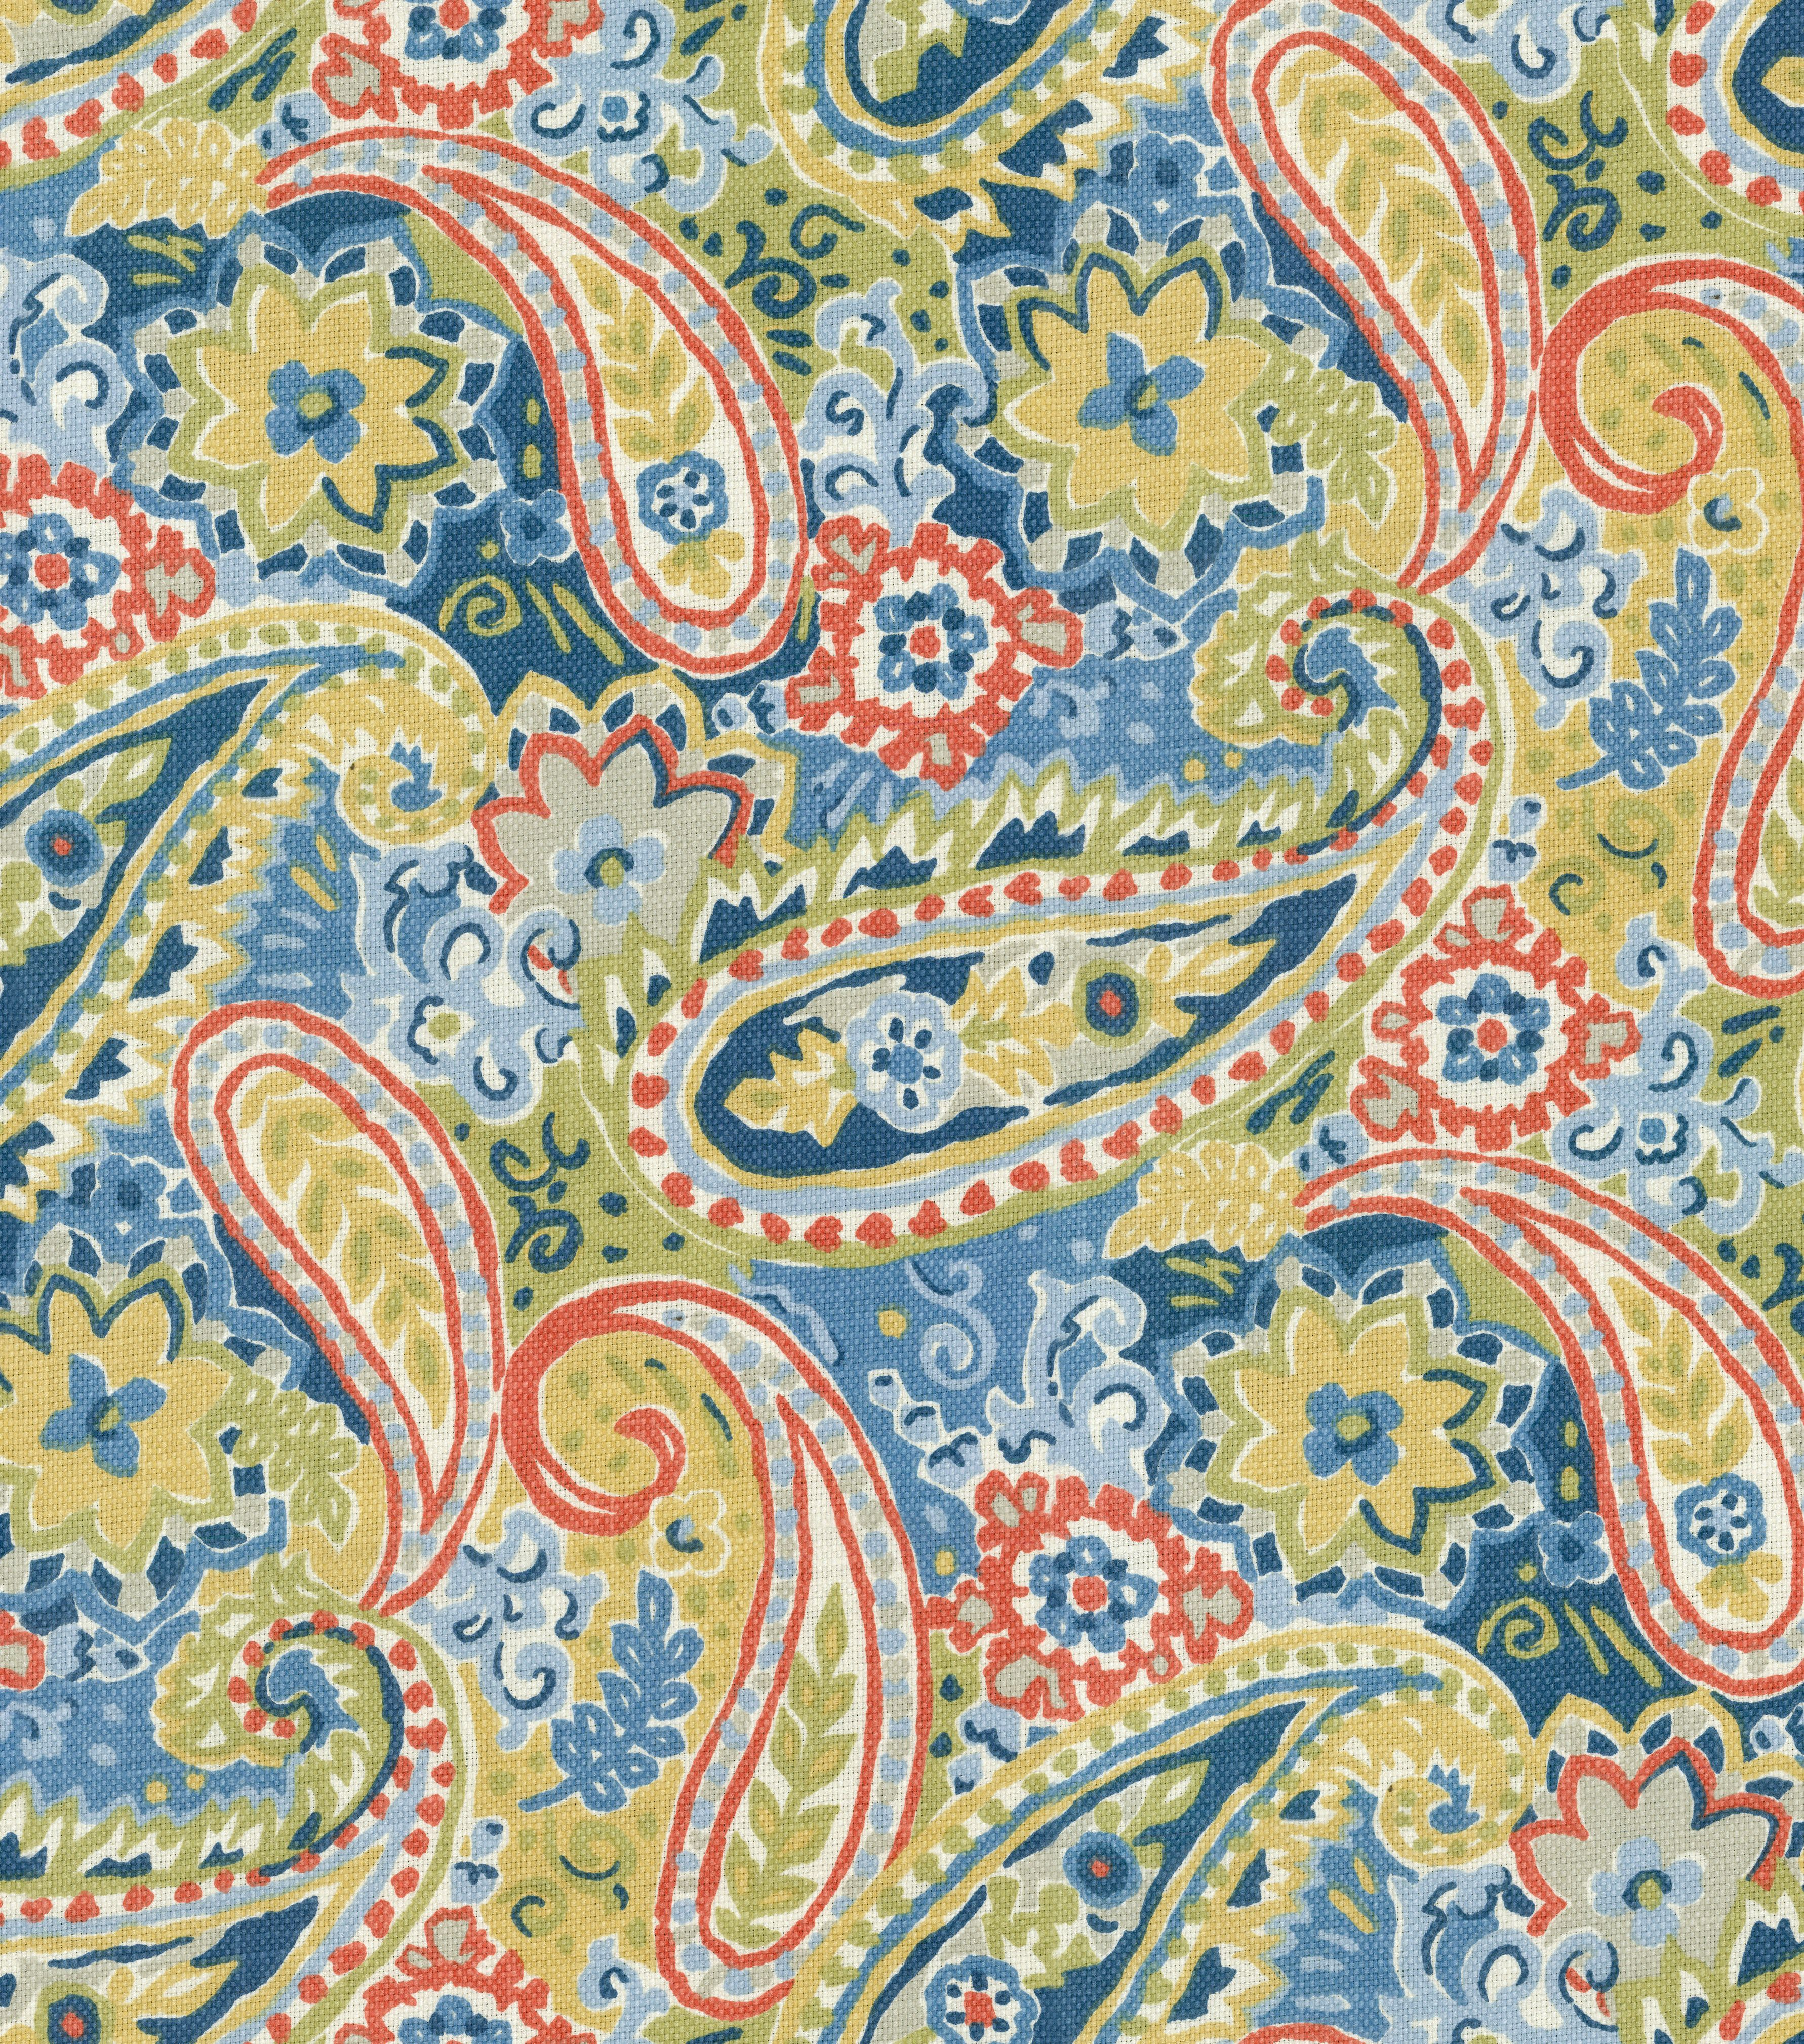 Home Decor Print Fabric-Pkaufmann Breeze Patriot at Joann